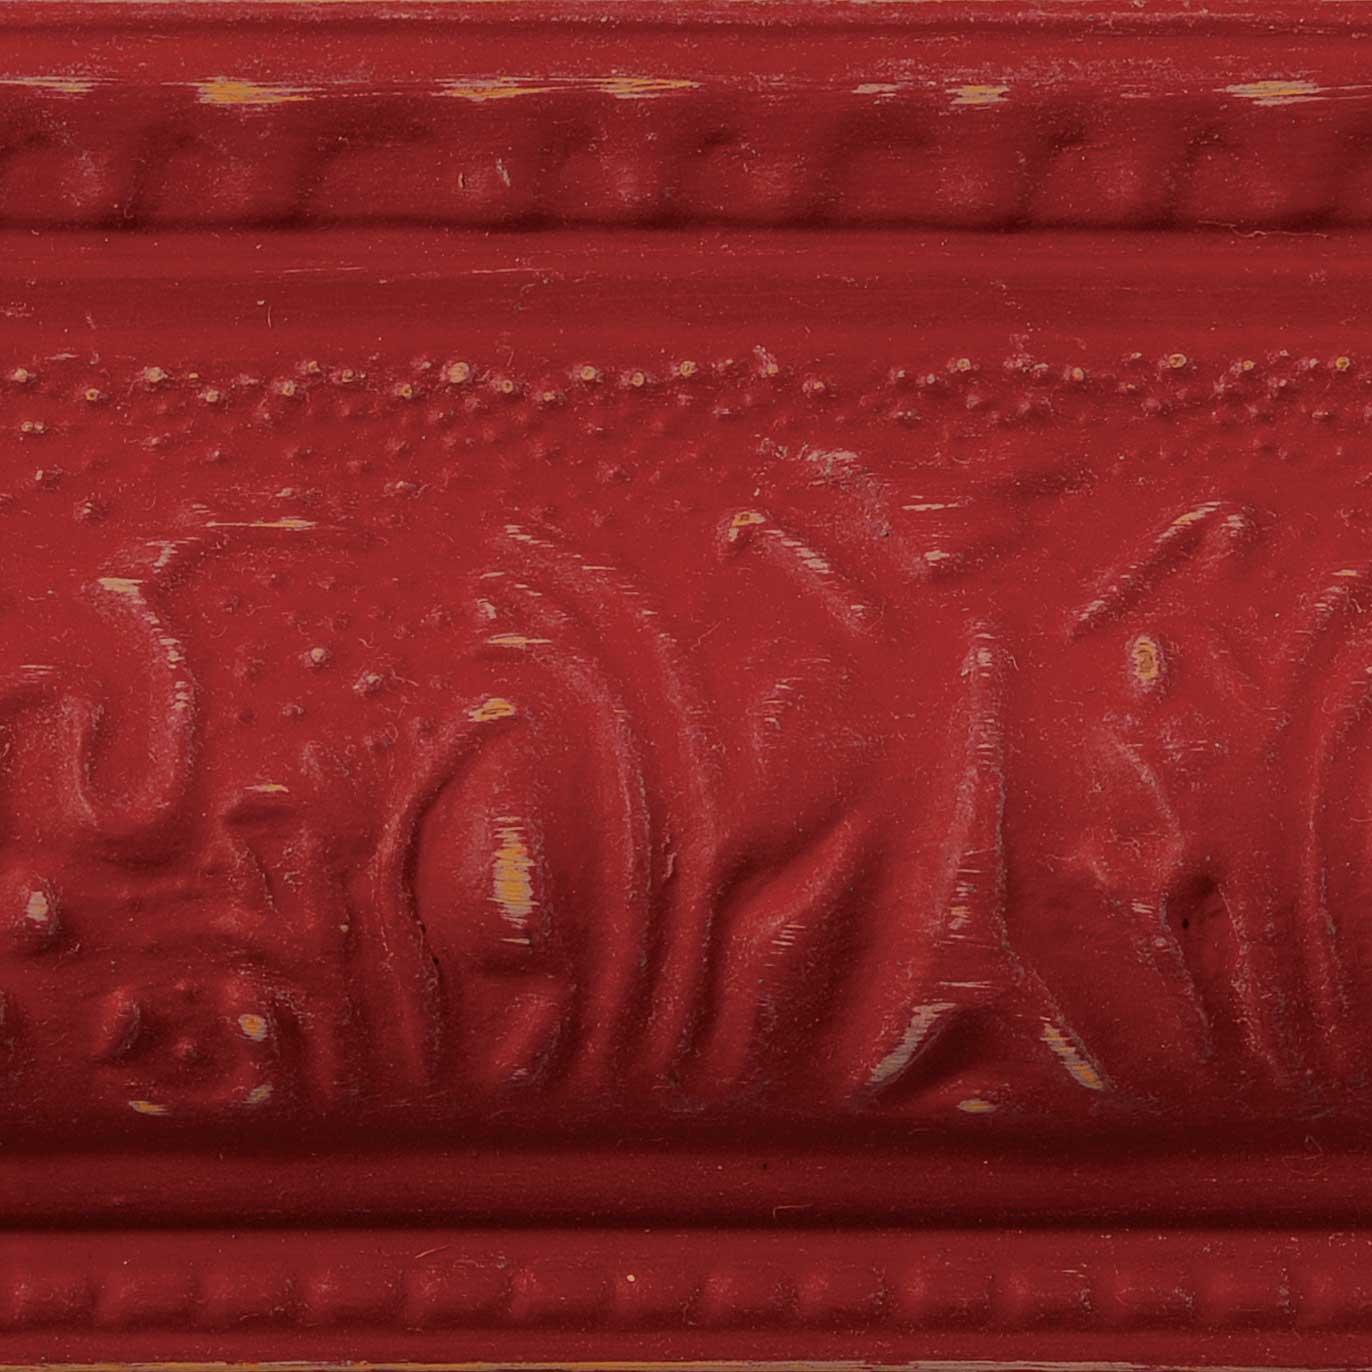 FolkArt ® Home Decor™ Chalk - Tuscan Red, 16 oz. - 34877